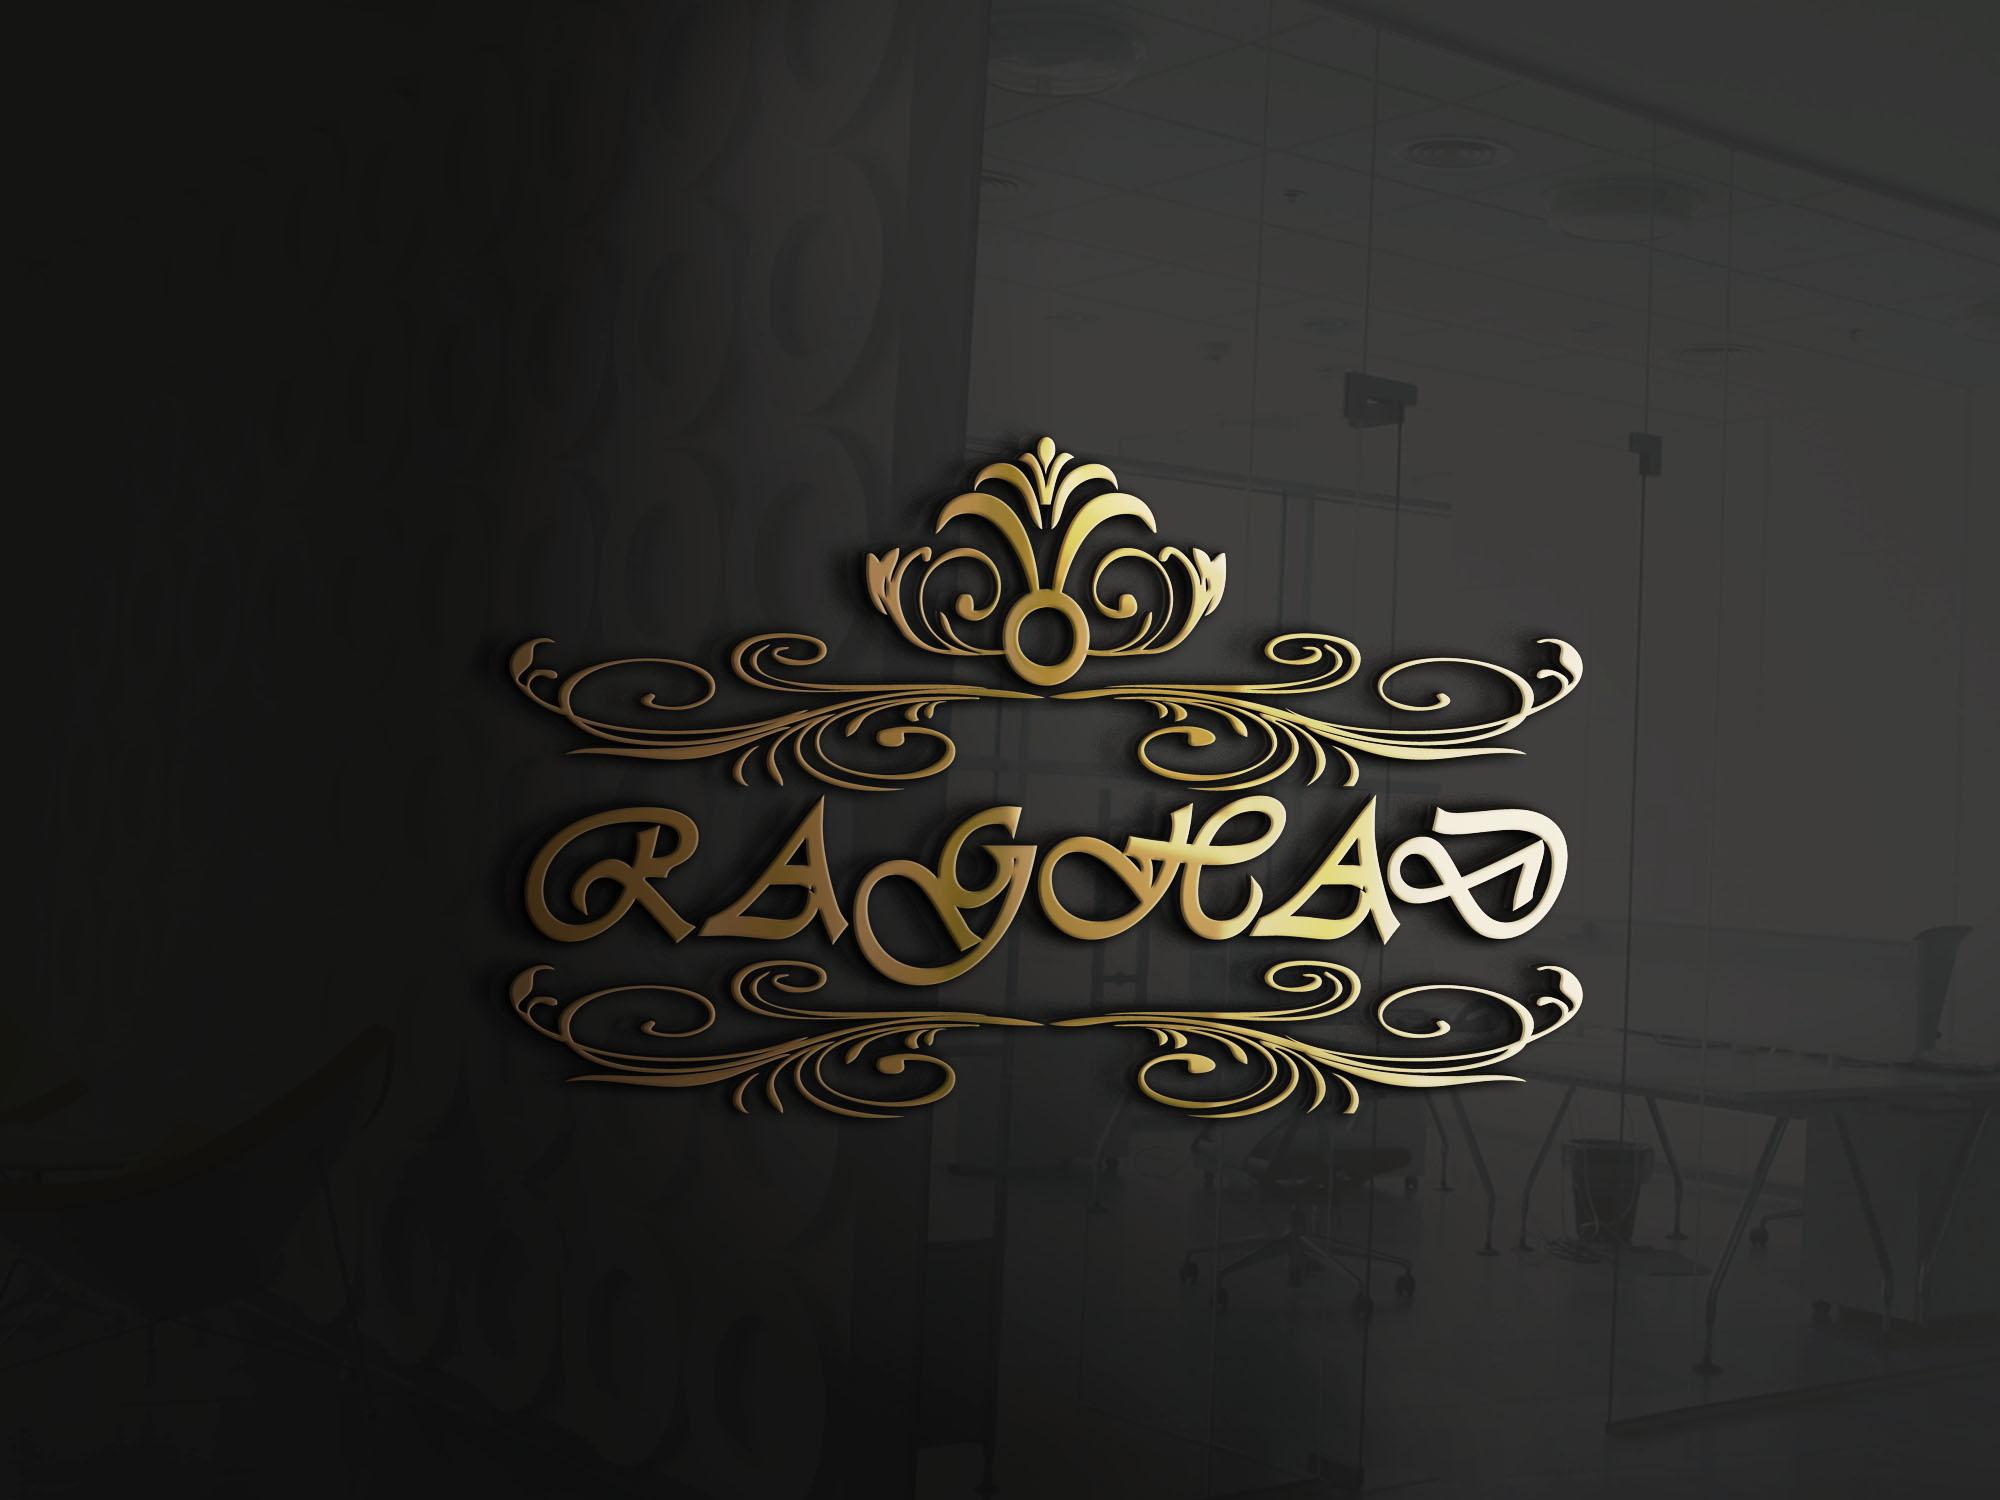 I will make a creative logo design.